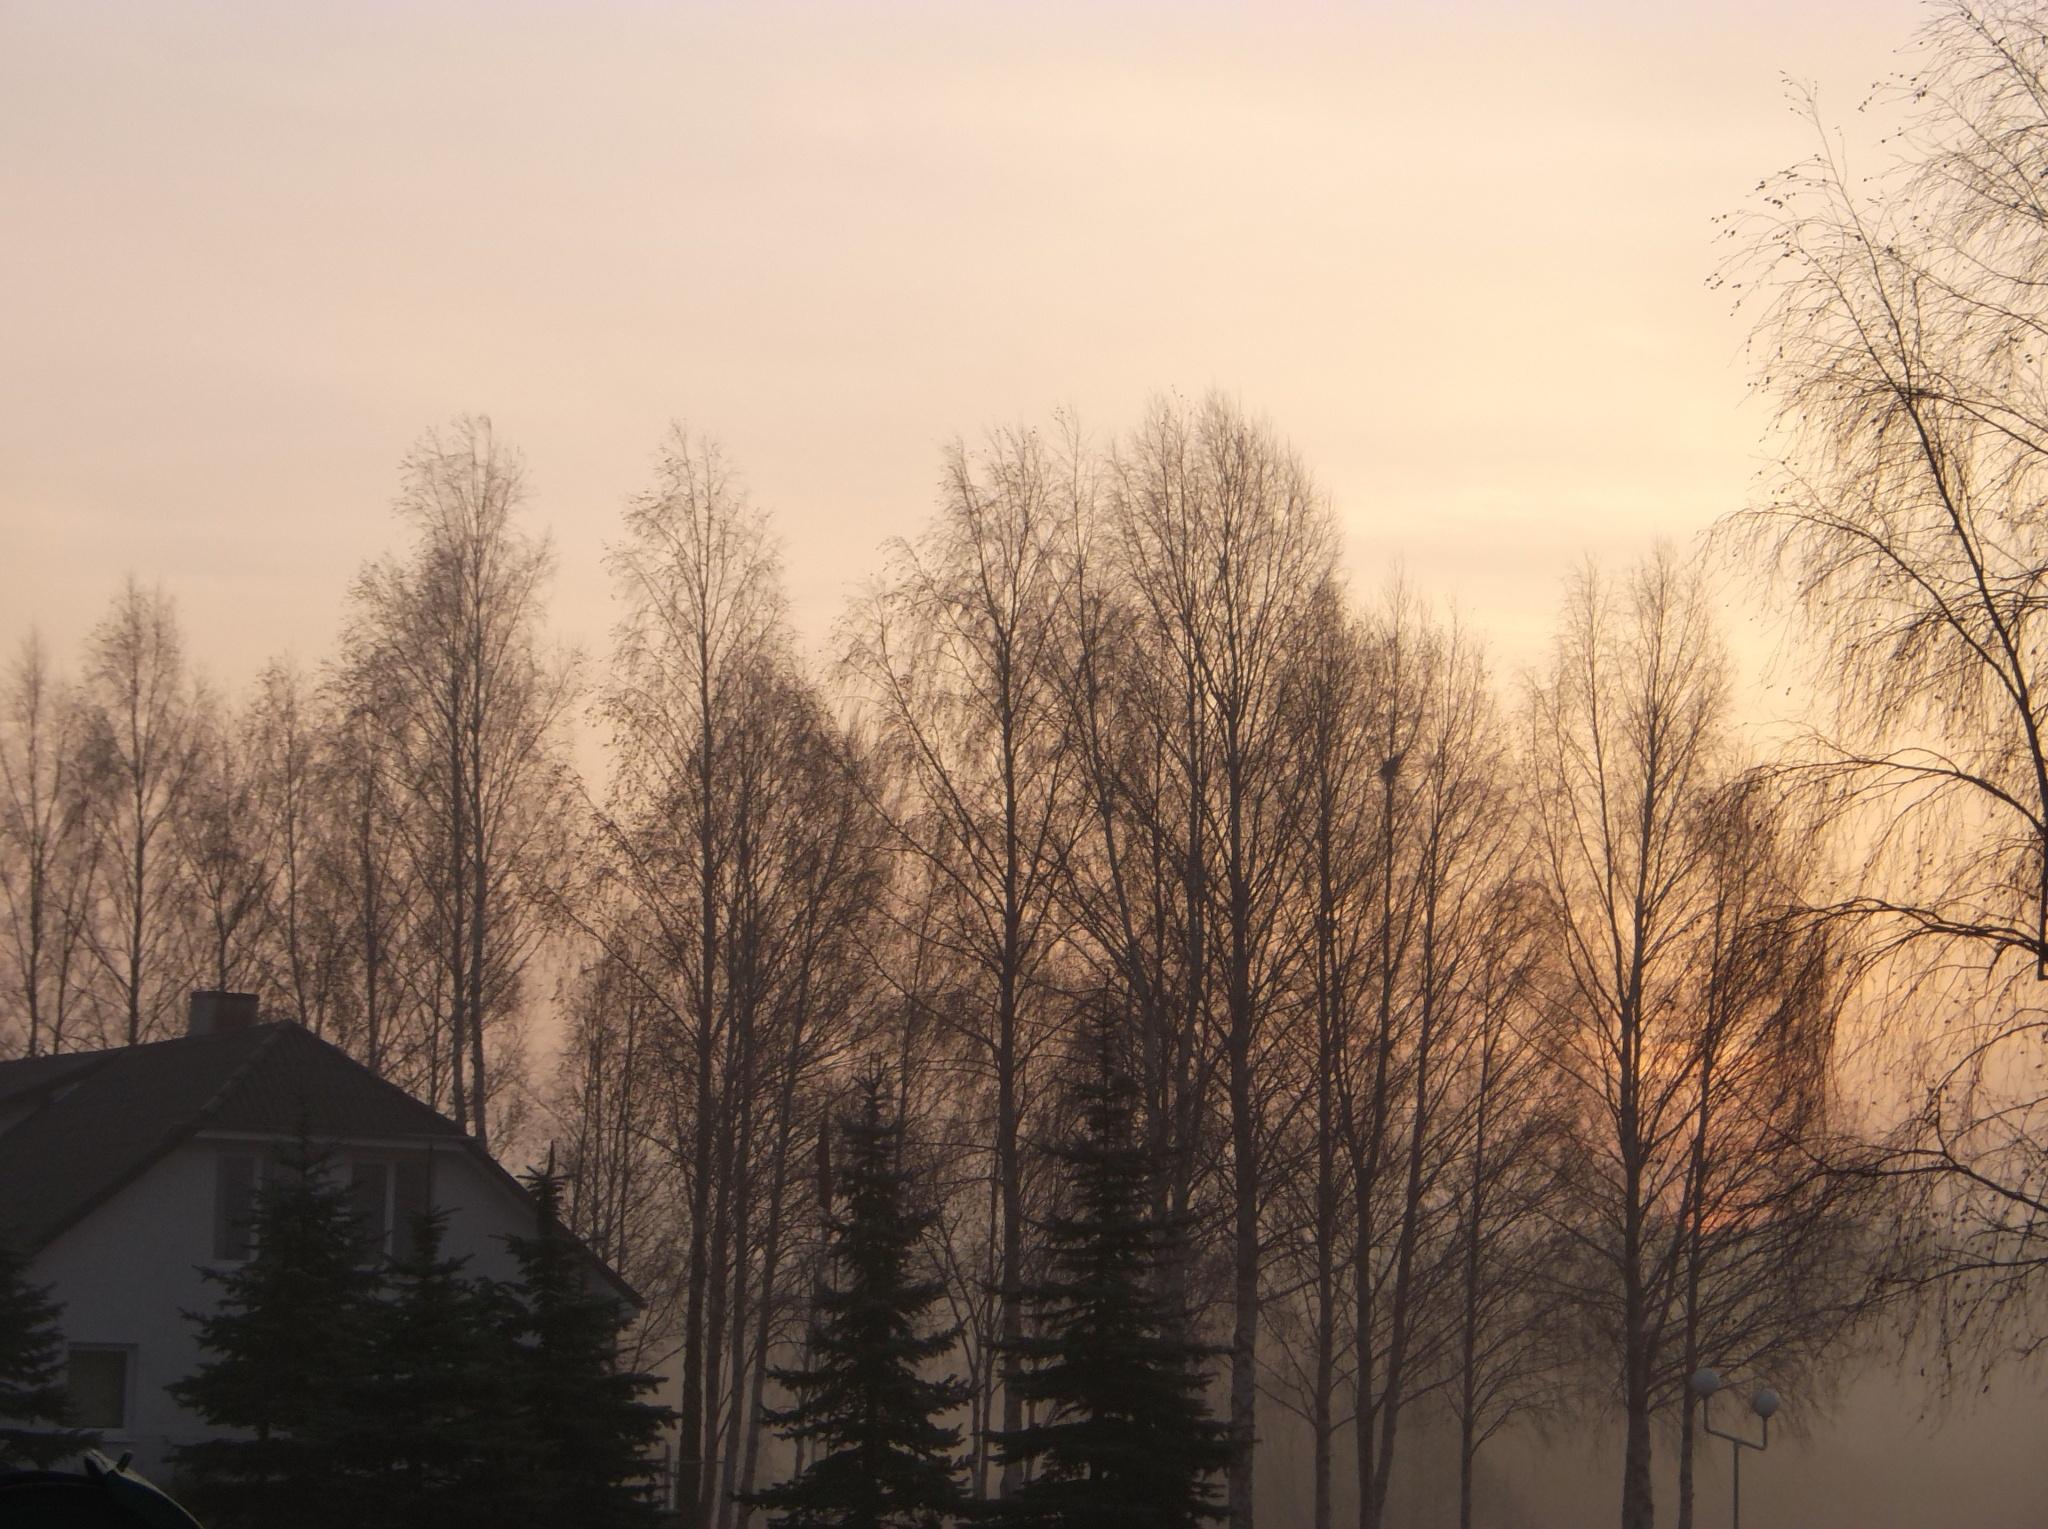 Early morning by uzkuraitiene62